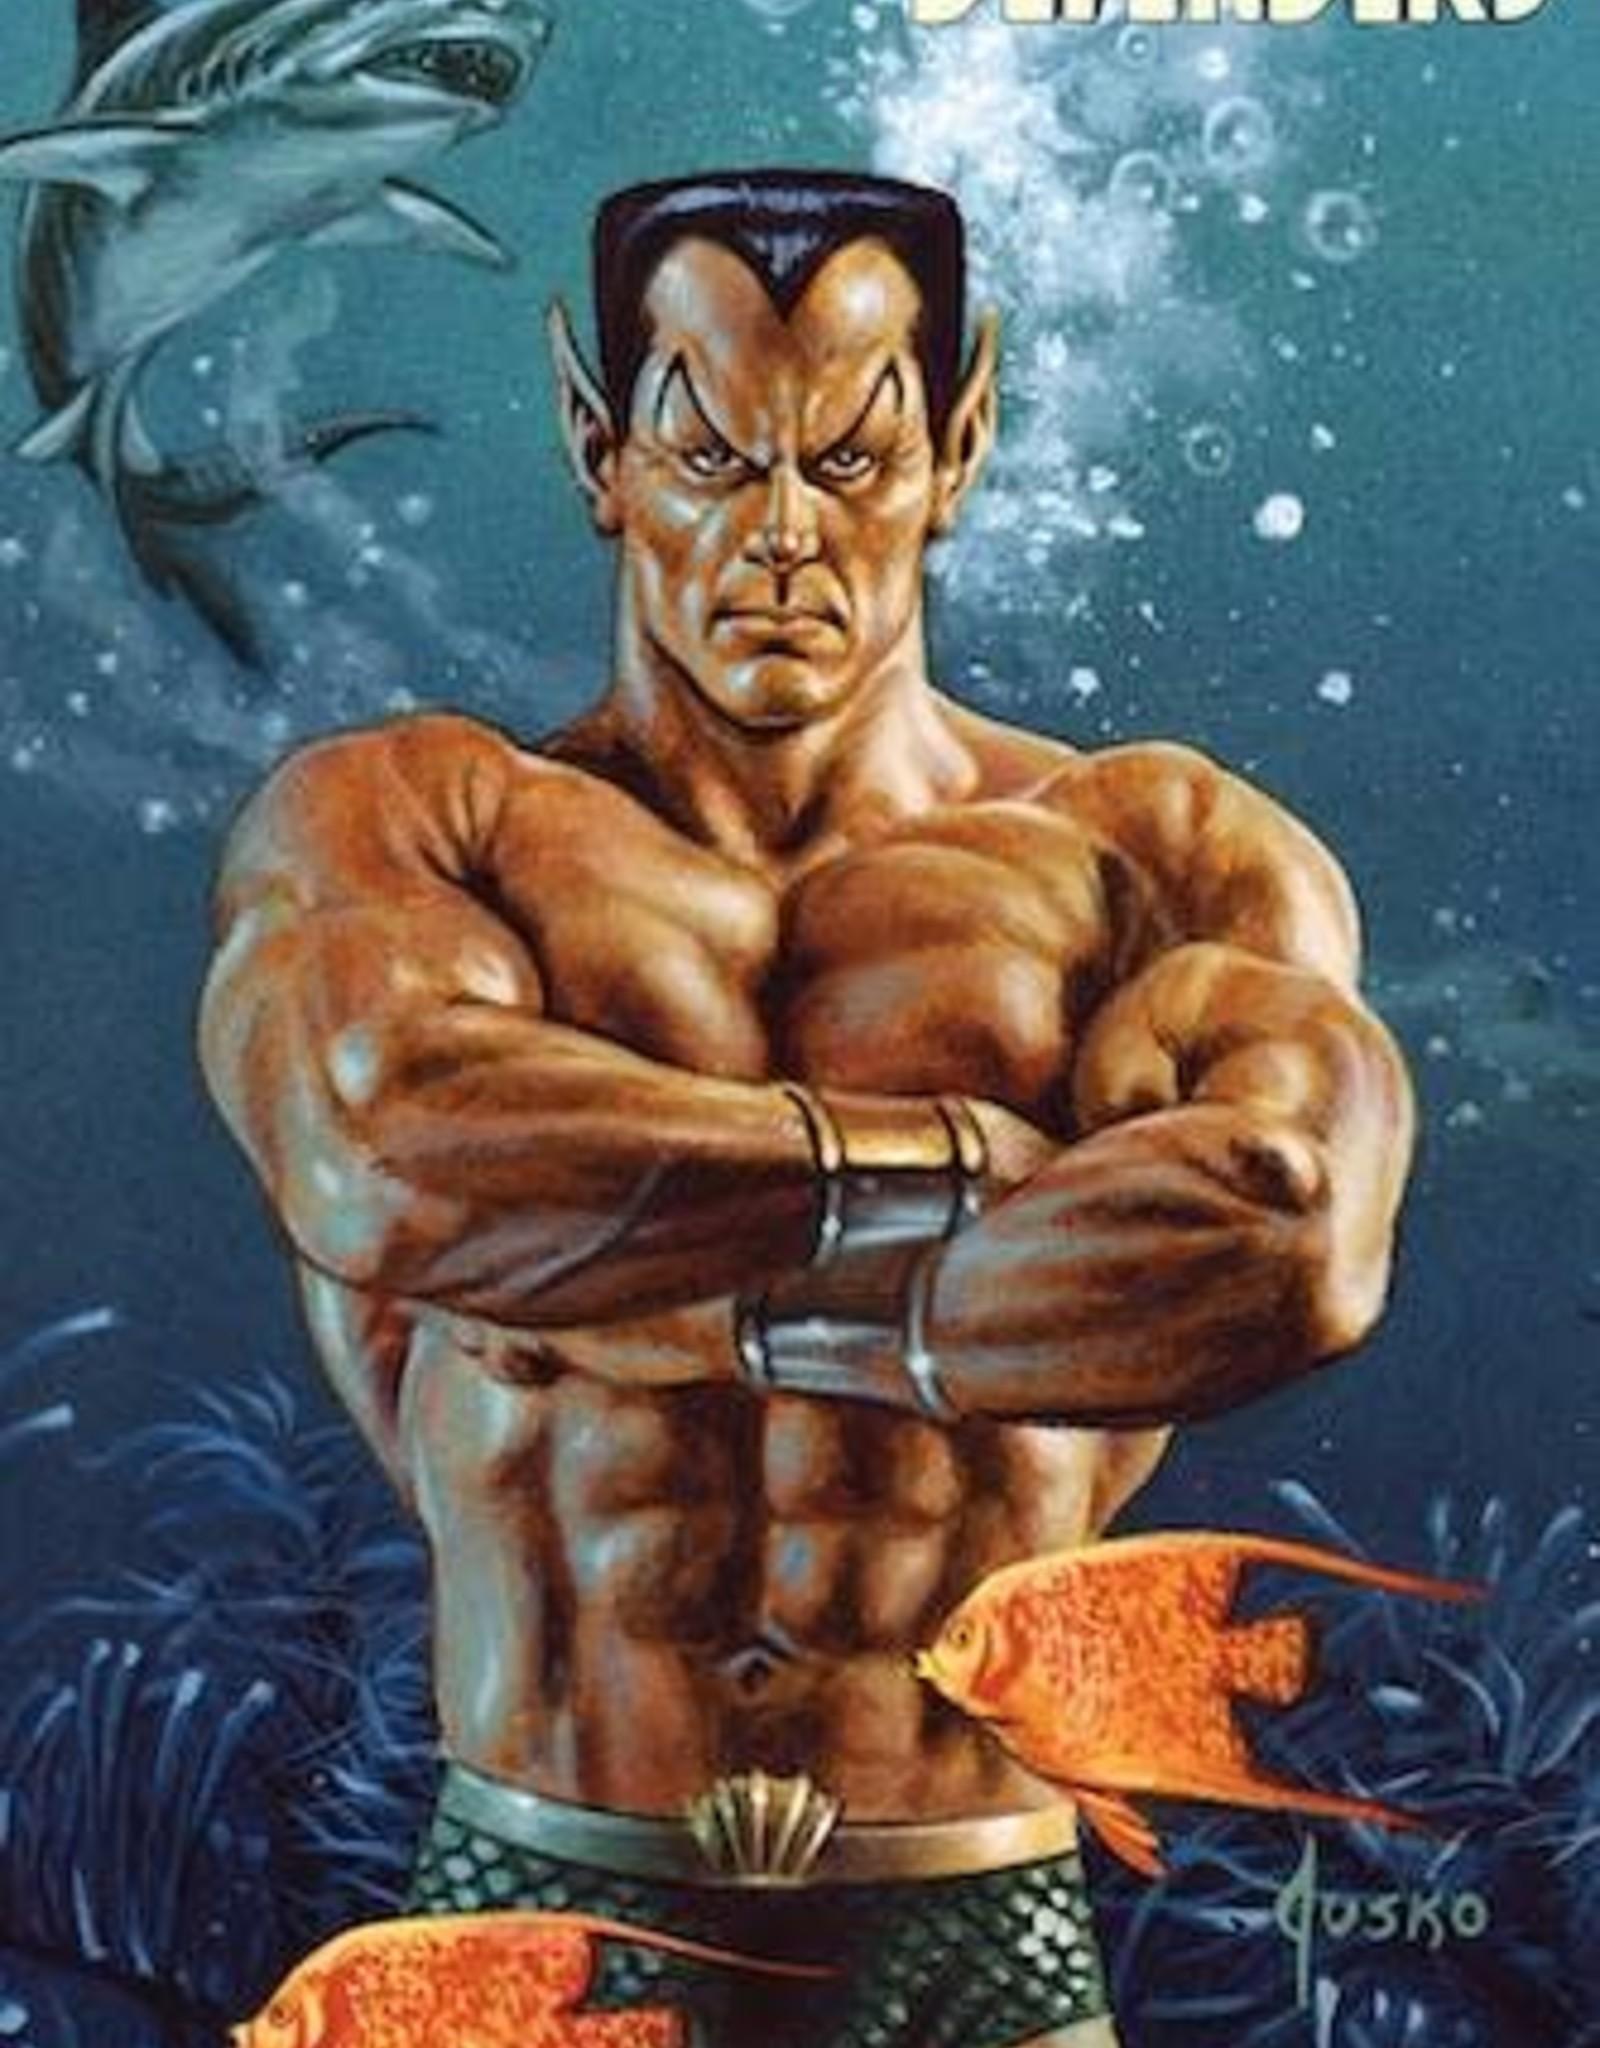 Marvel Comics Defenders #3 Jusko Marvel Masterpieces Variant